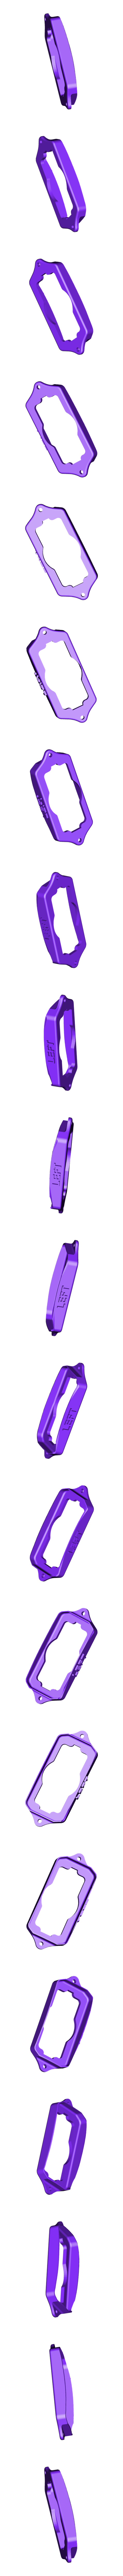 speaker_left.STL Download free STL file Poppy Torso • 3D printable model, PoppyProject